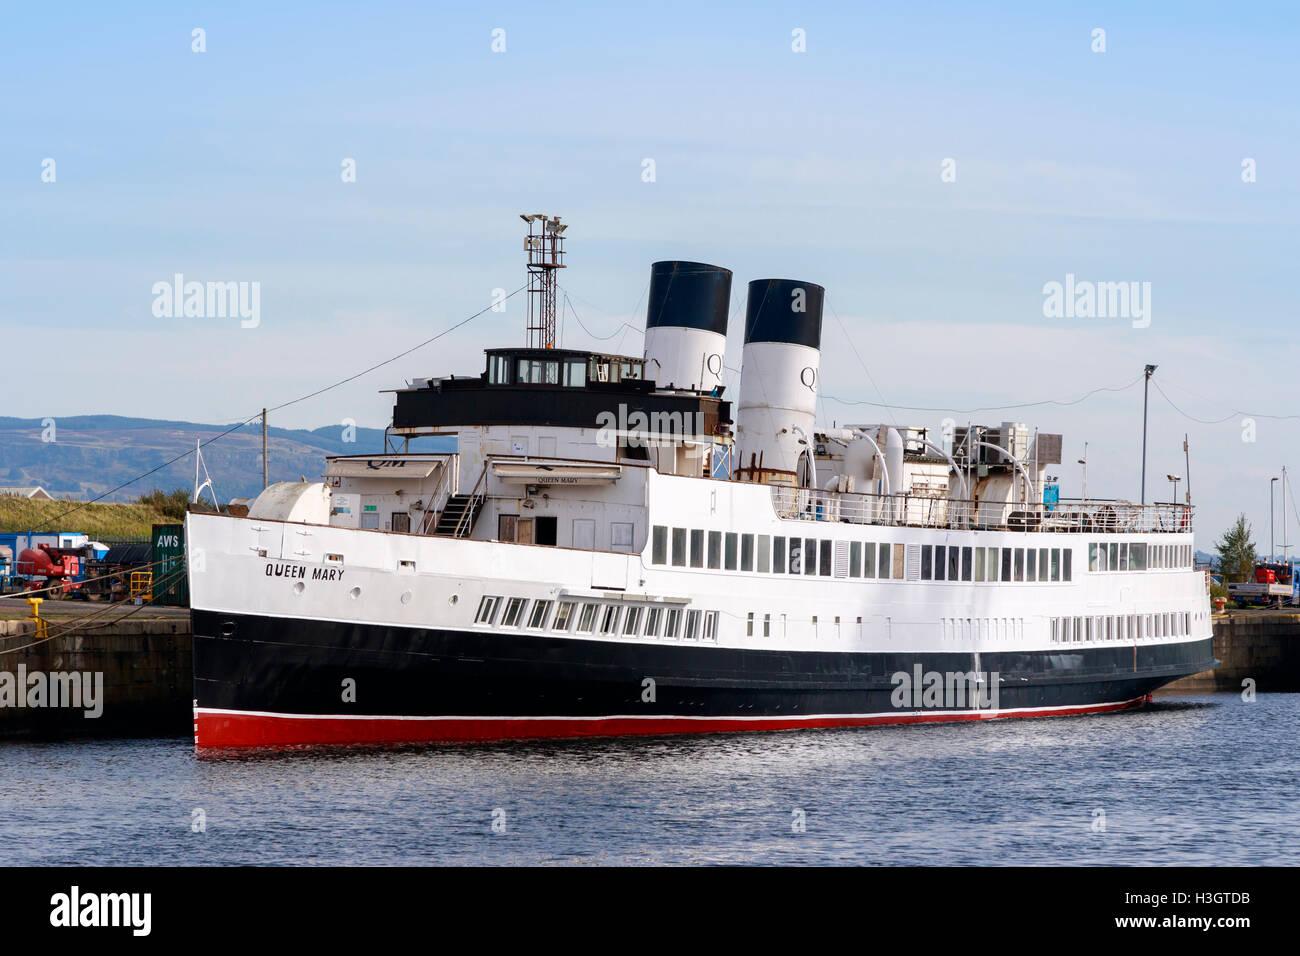 TSS (Turbine Steam Ship) Queen Mary, built 1933 at Dumbarton, berthed at James Watt Docks awaiting renovation and - Stock Image